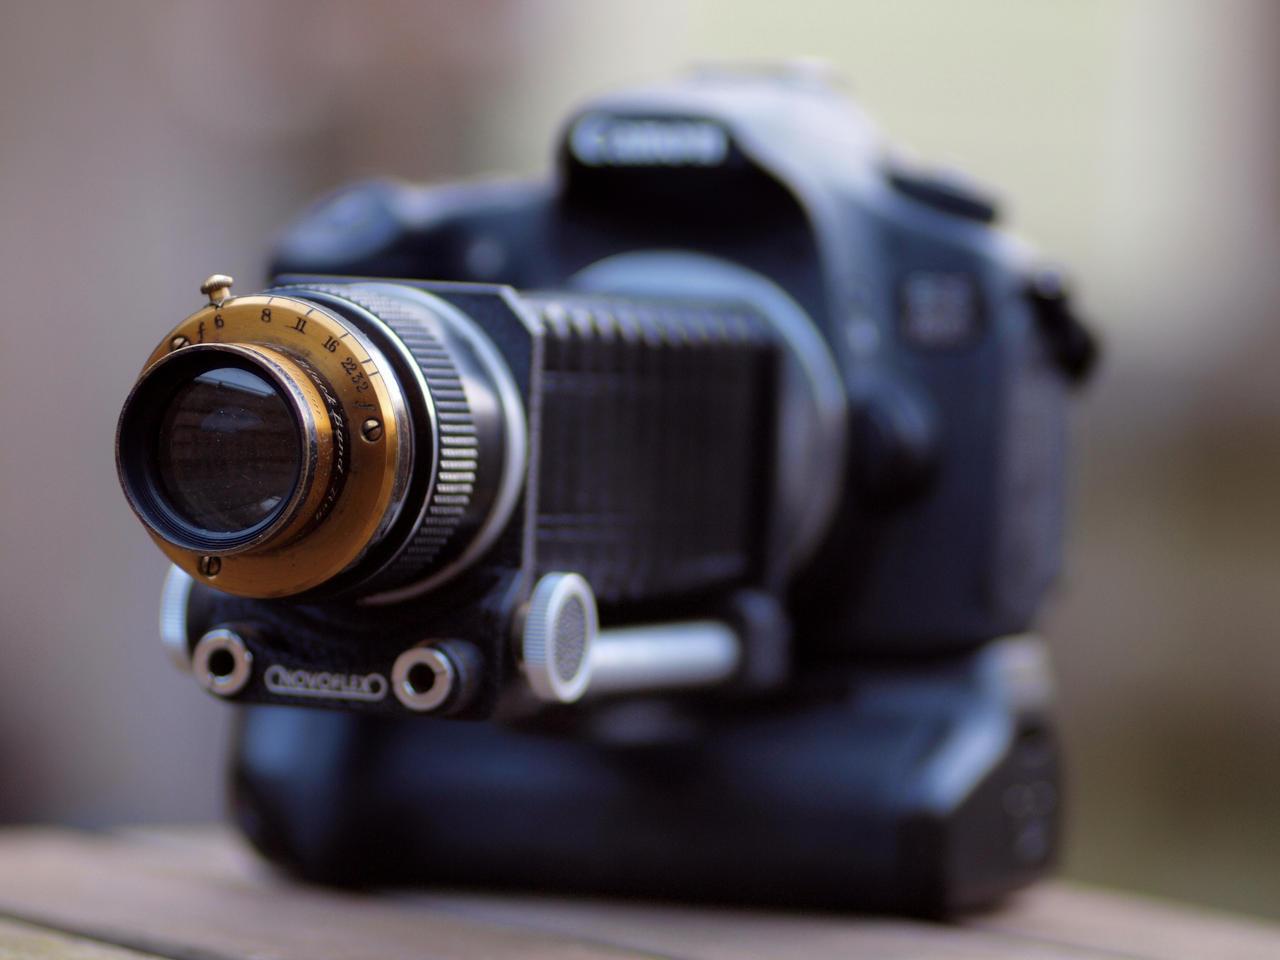 London Stereoscopic Co lens on Canon 60D